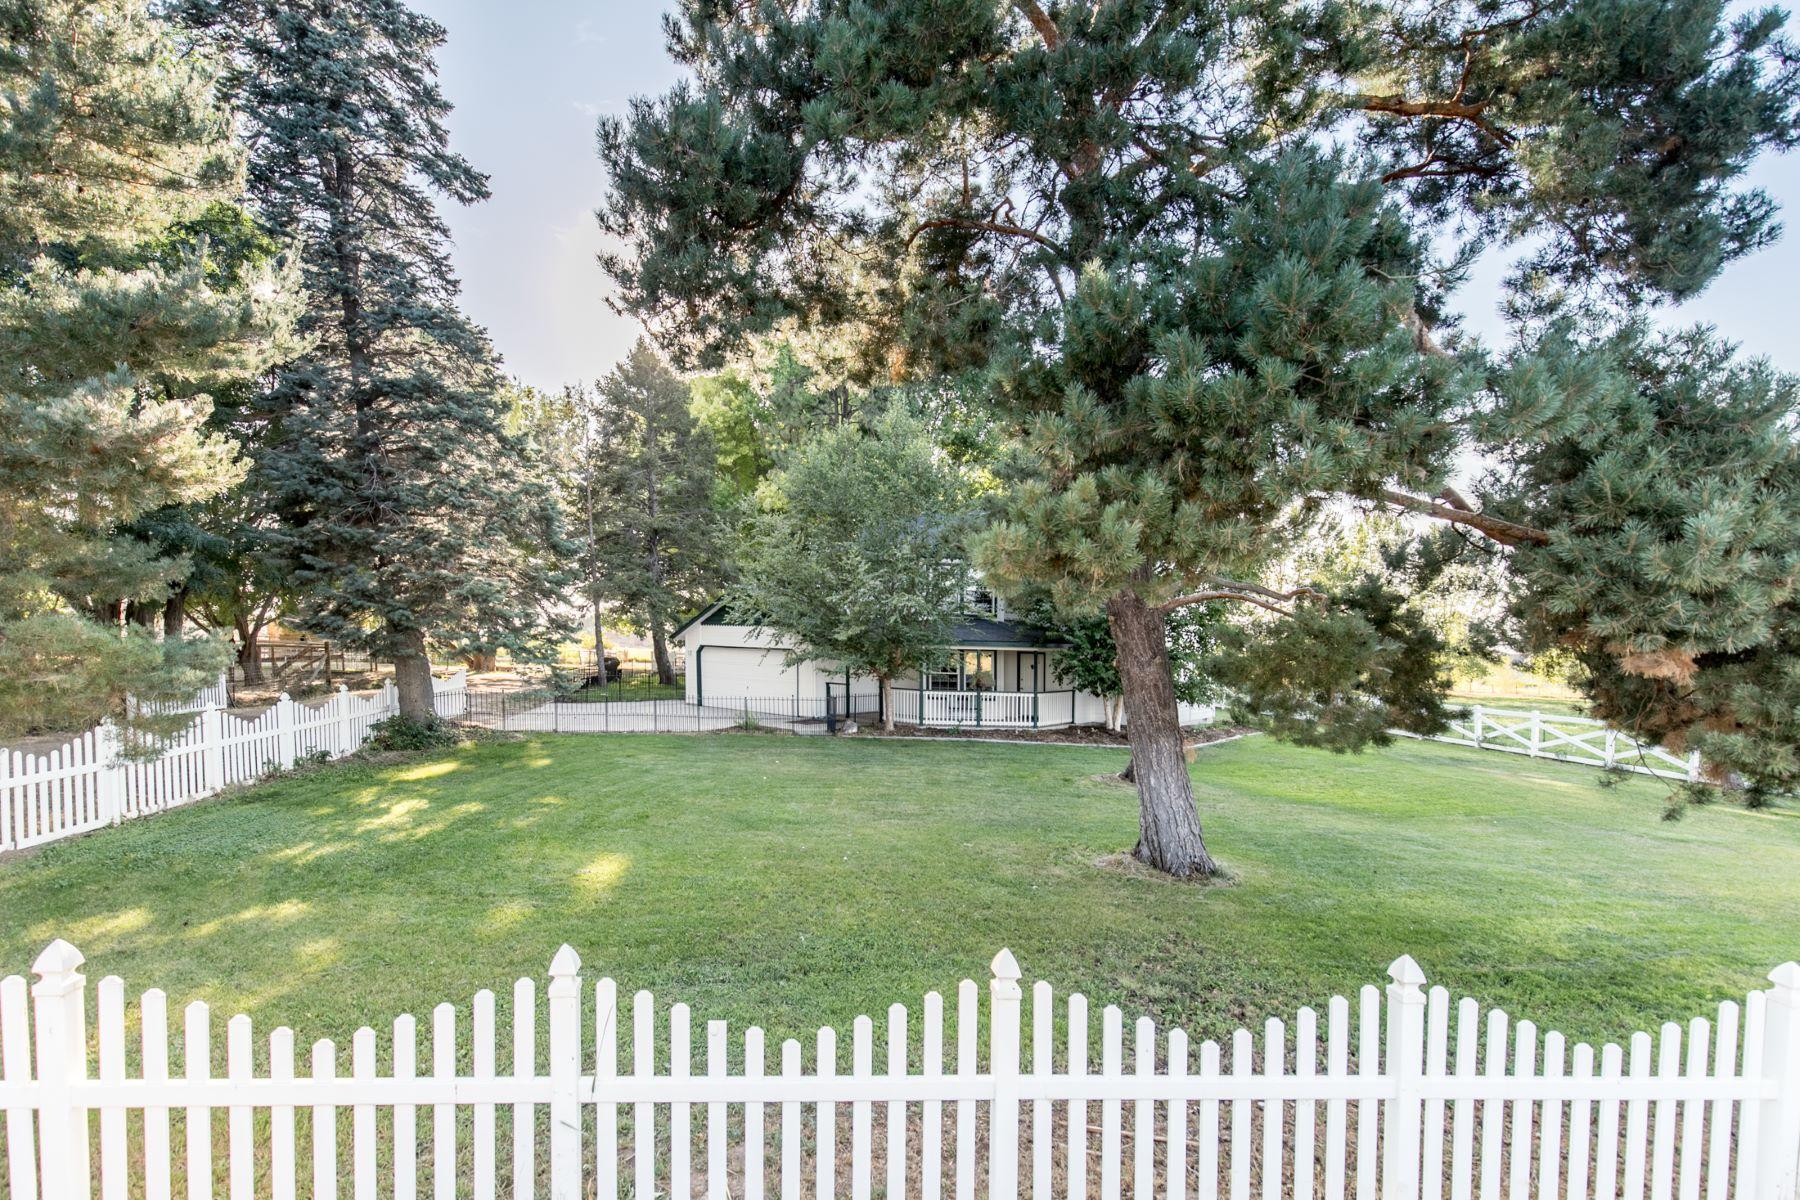 Single Family Homes for Active at 125 Eagle, Kuna 125 N Eagle Kuna, Idaho 83634 United States